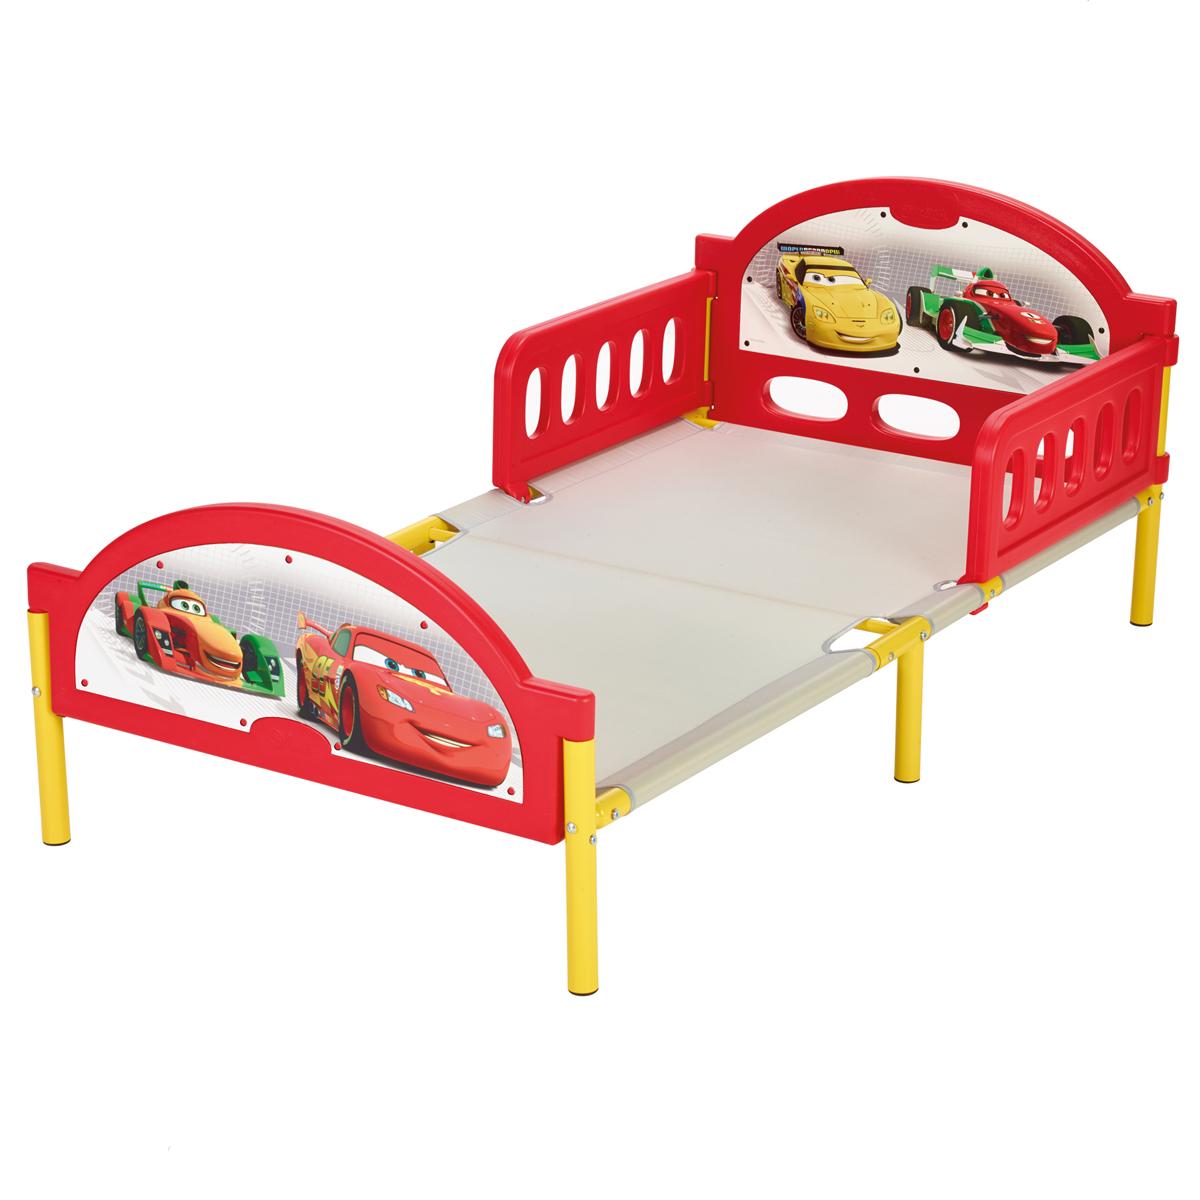 Full Size of Disney Cars Toddler Bed Bett 140x70 Cm Kinderbett Kindermbel Kinder Wohnwert Betten Paidi Xxl Flach Günstig Kaufen Hohes Breckle Mit Rutsche Himmel Massivholz Bett Cars Bett